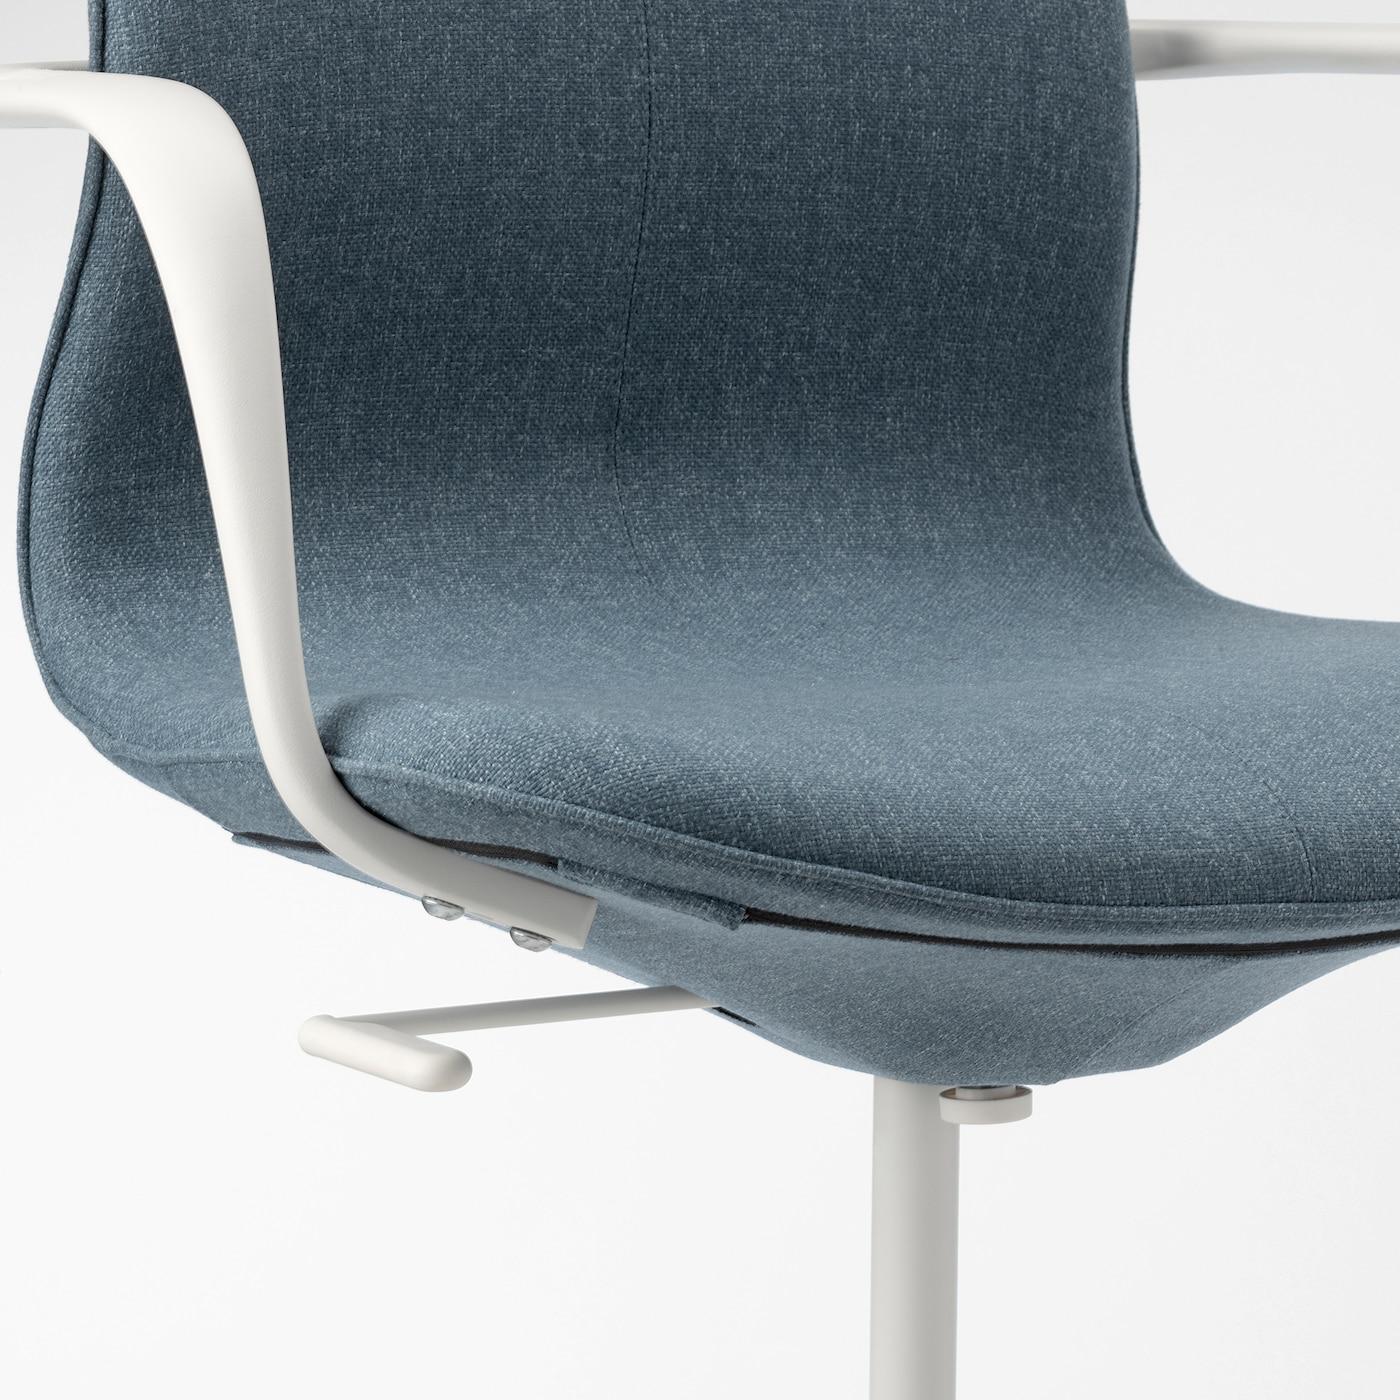 LÅNGFJÄLL Sedia da ufficio con braccioli Gunnared blu, bianco